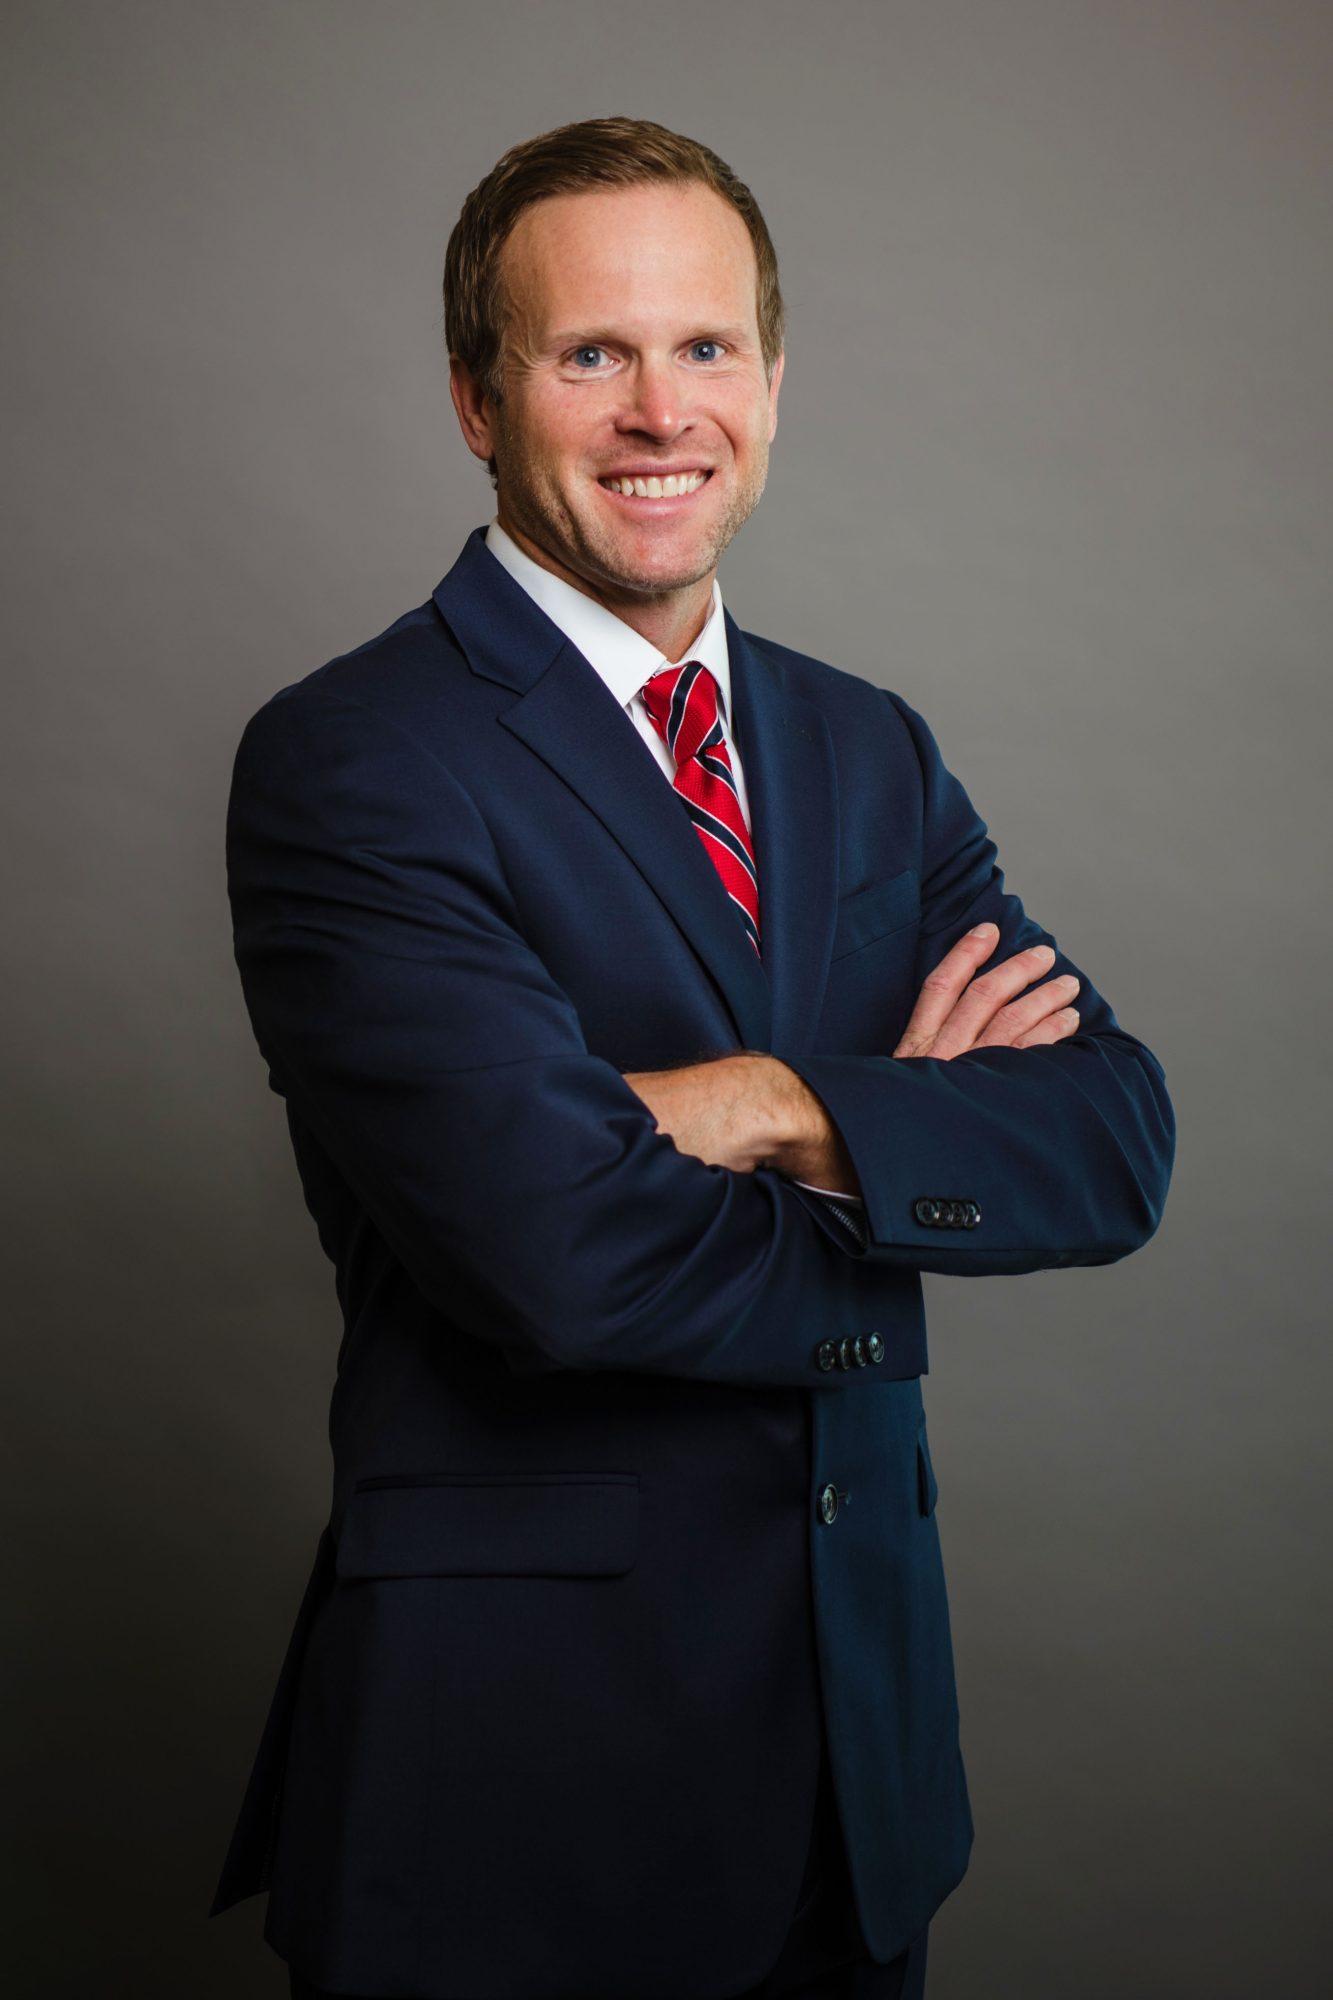 Photo of Matthew Gerlach, MD